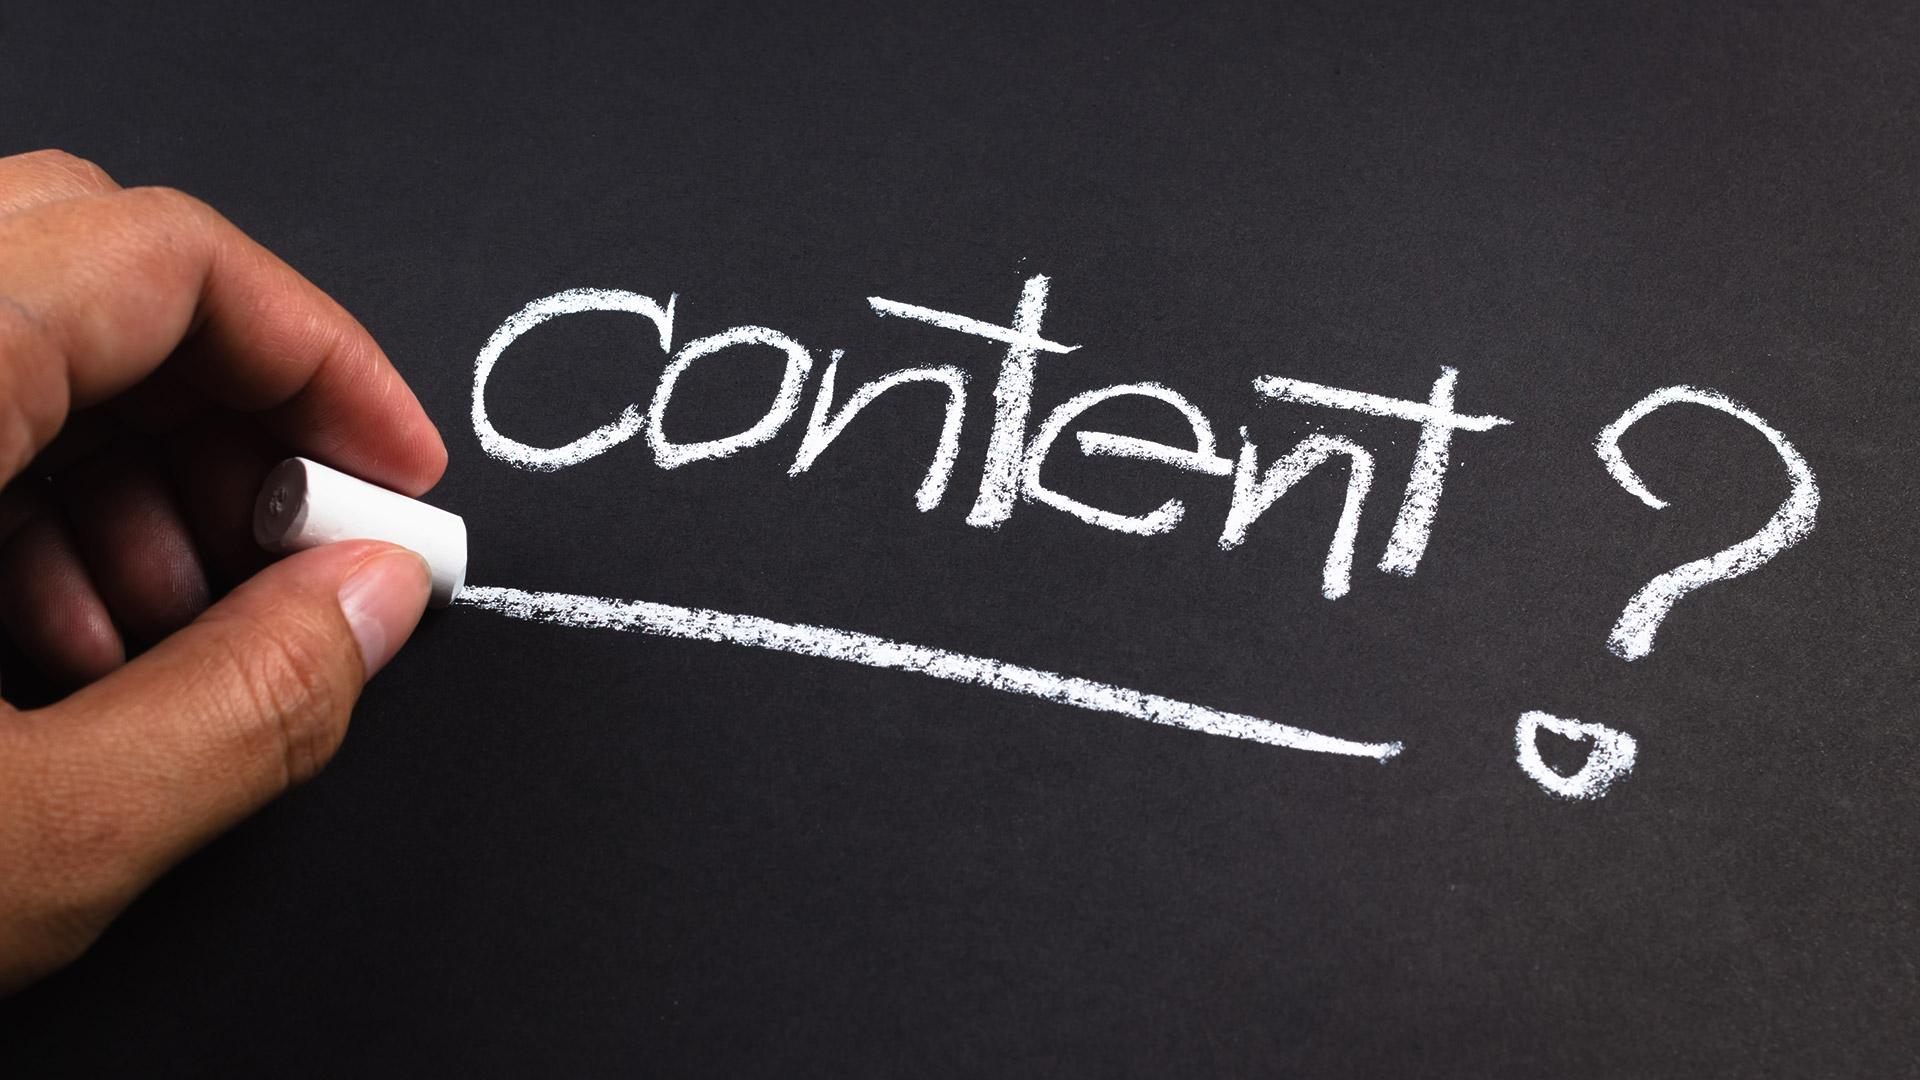 quảng cáo online, mỹ phẩm online, online